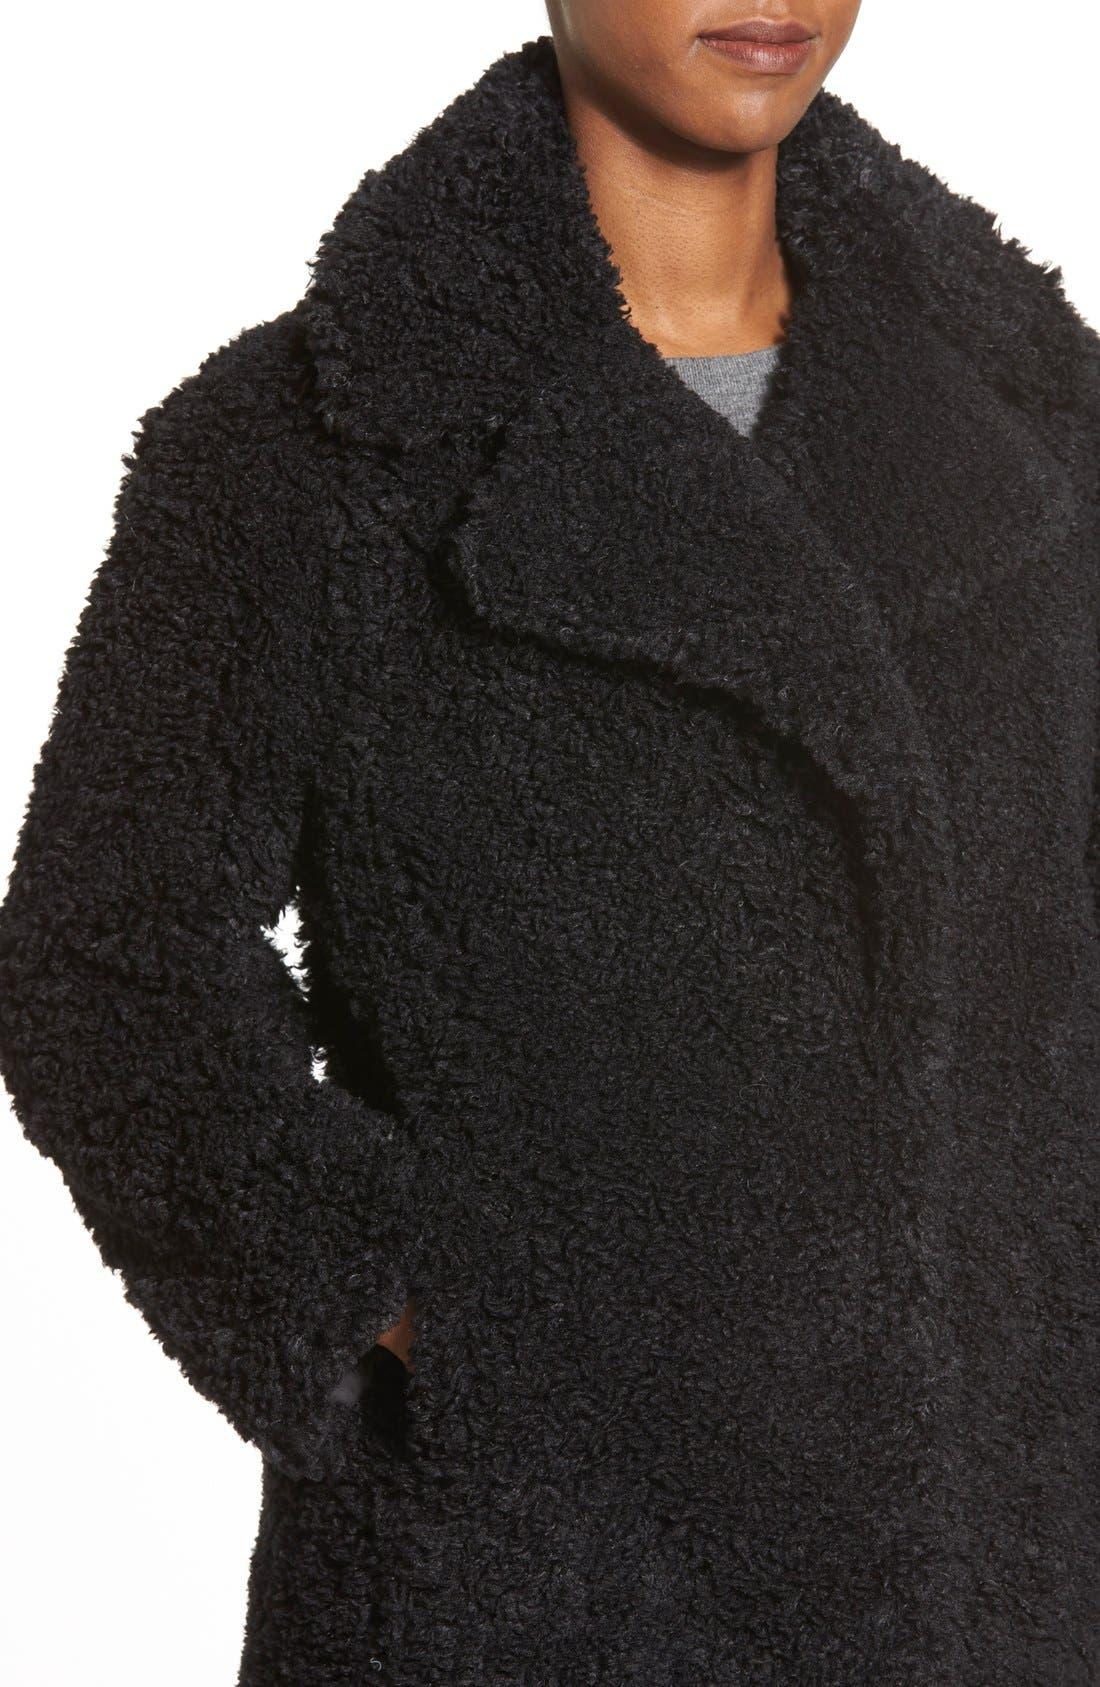 KENSIE,                             'Teddy Bear' Notch Collar Reversible Faux Fur Coat,                             Alternate thumbnail 5, color,                             001